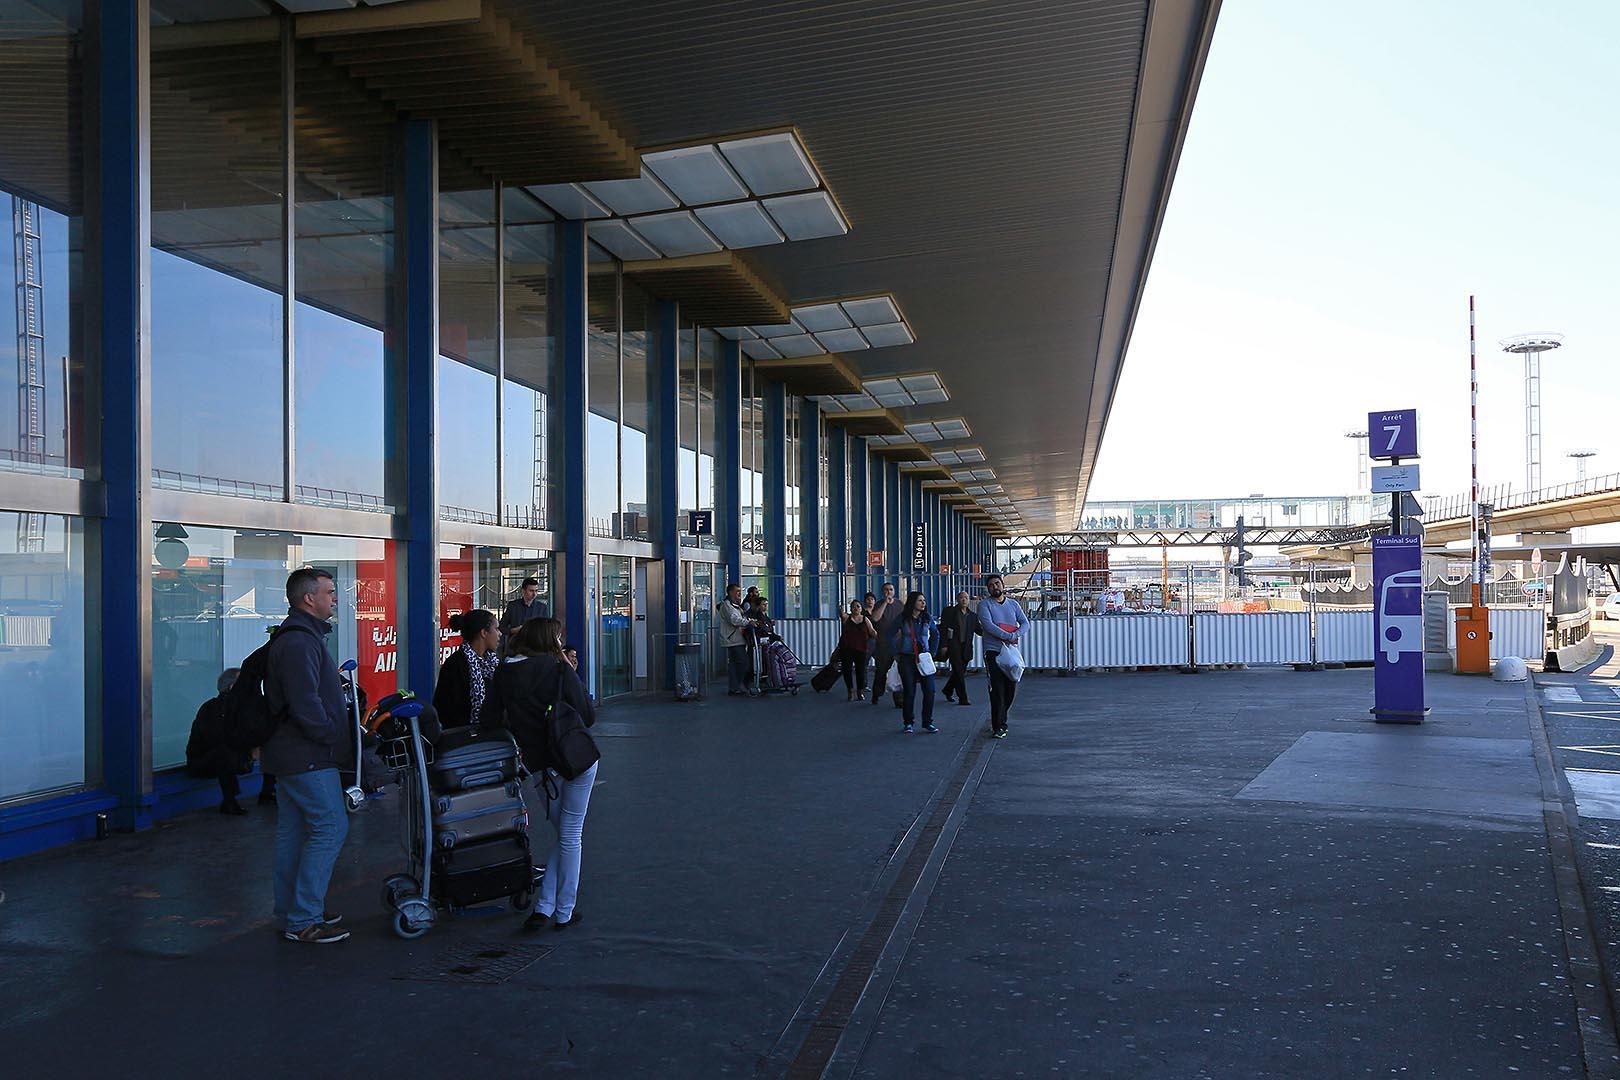 Aeroporto Orly Paris : Aéroport paris orly